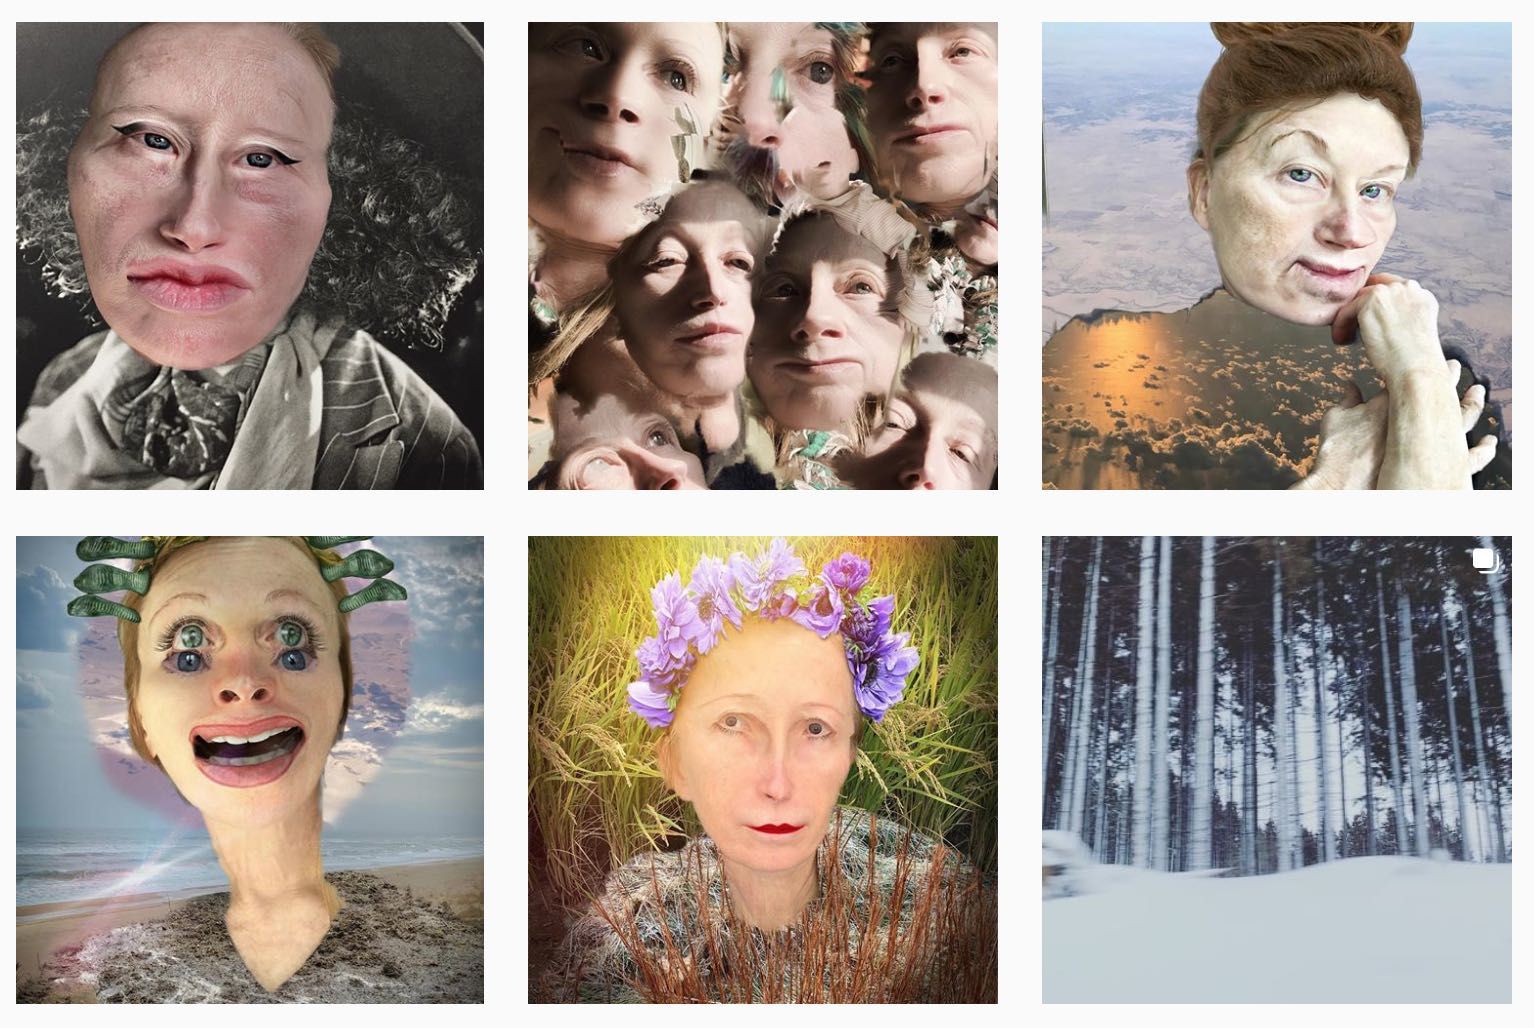 Cindy Sherman on Instagram 4 panels